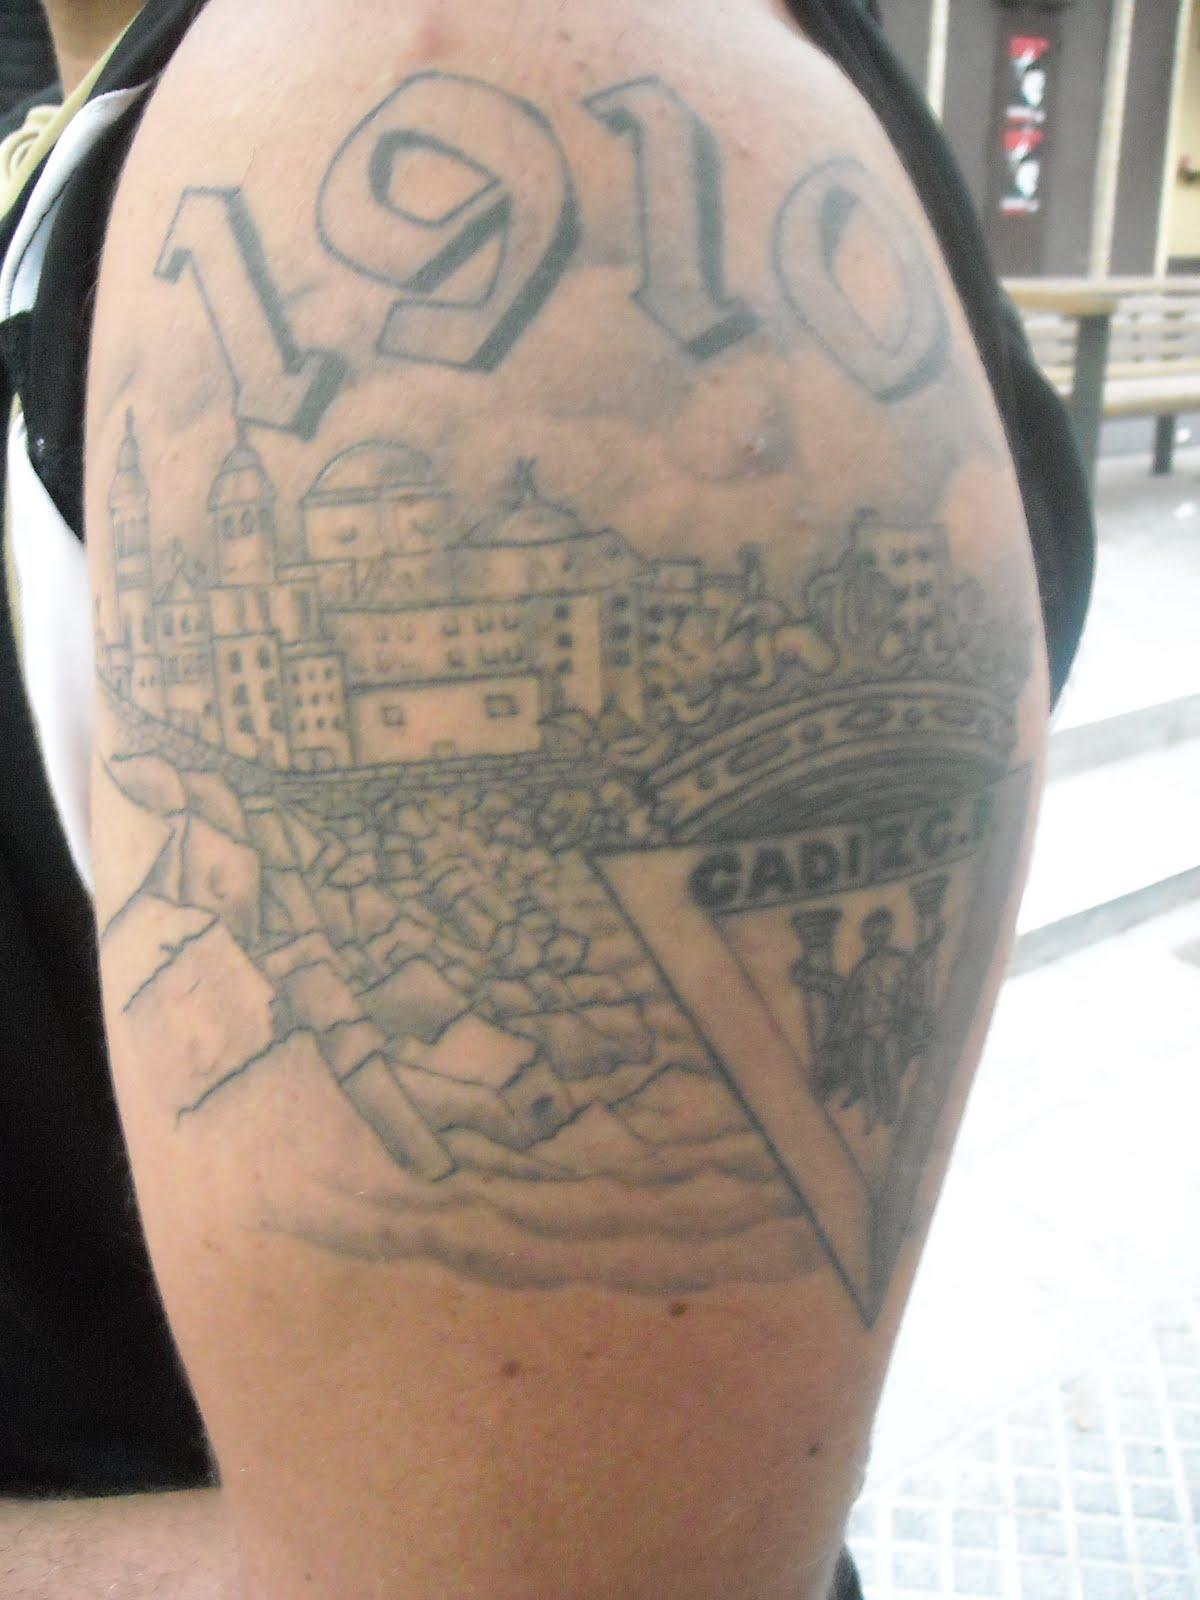 Tatuajes Cadiz tatuajes cadiz